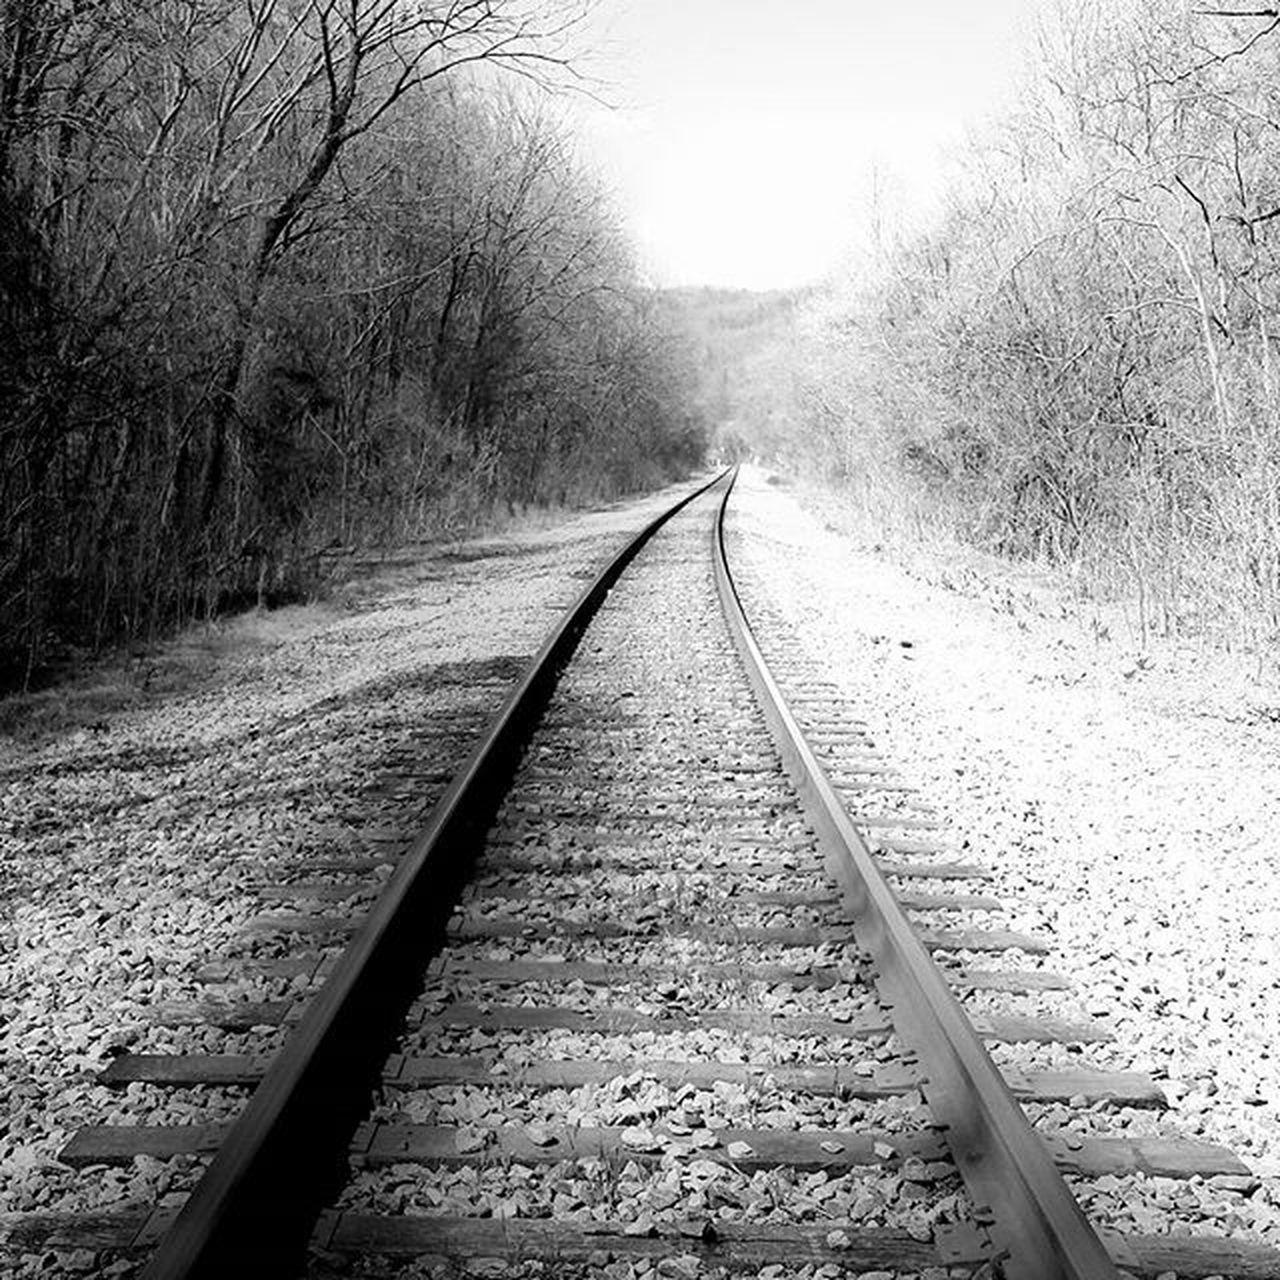 Hotsprings Hotspringsnc Hotspringresortandspa Hotspringscampground Train Tracks Blackandwhite Photography Blackandwhitephoto Blackandwhite